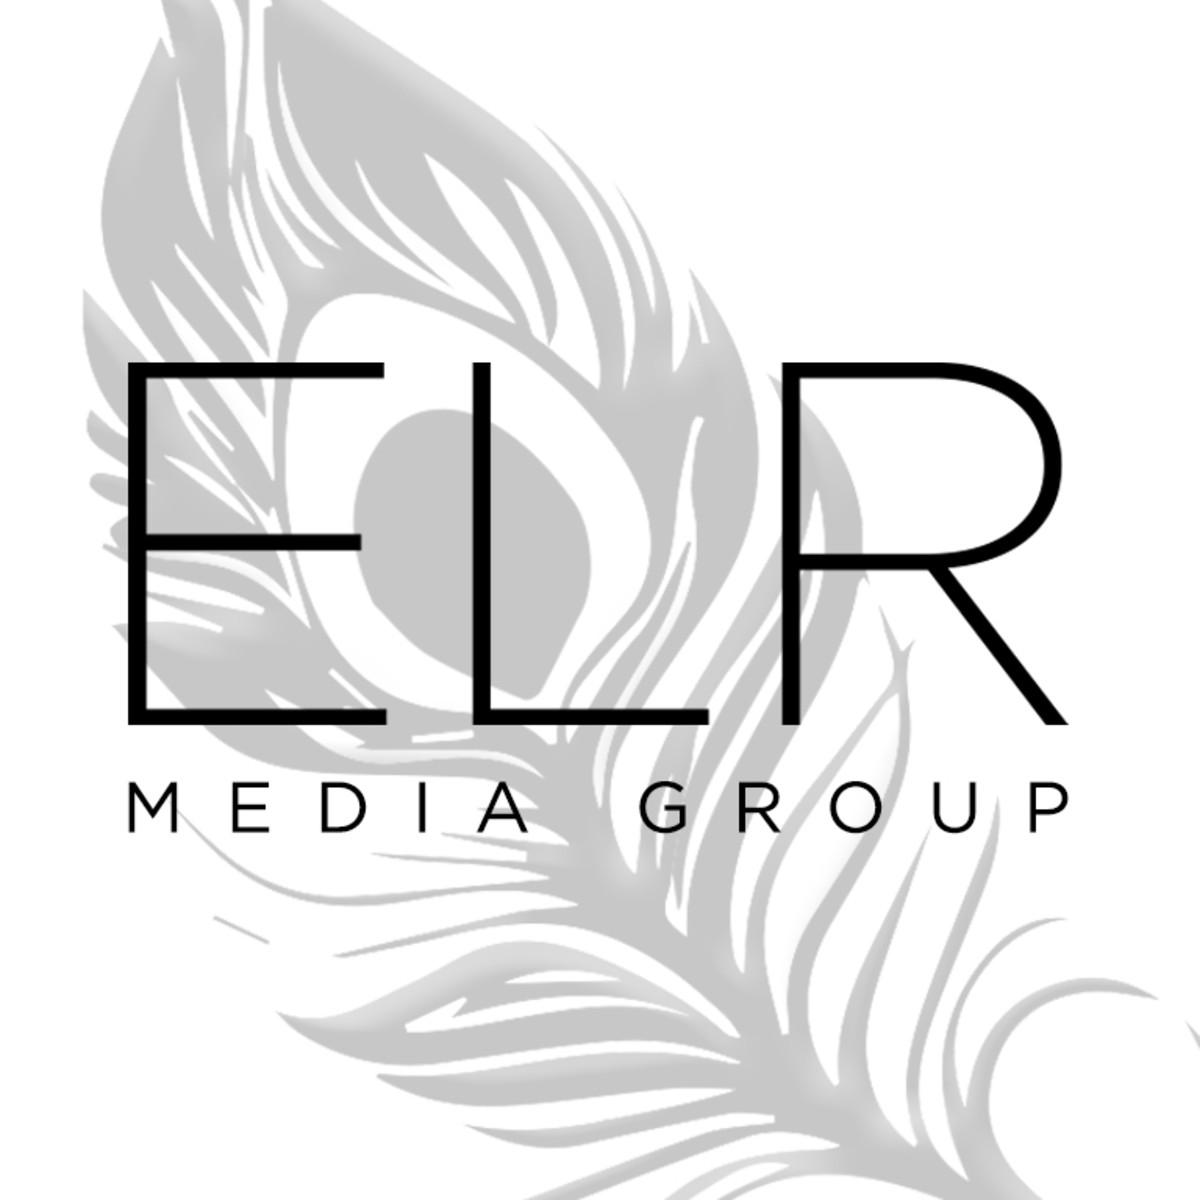 elr logo.jpg